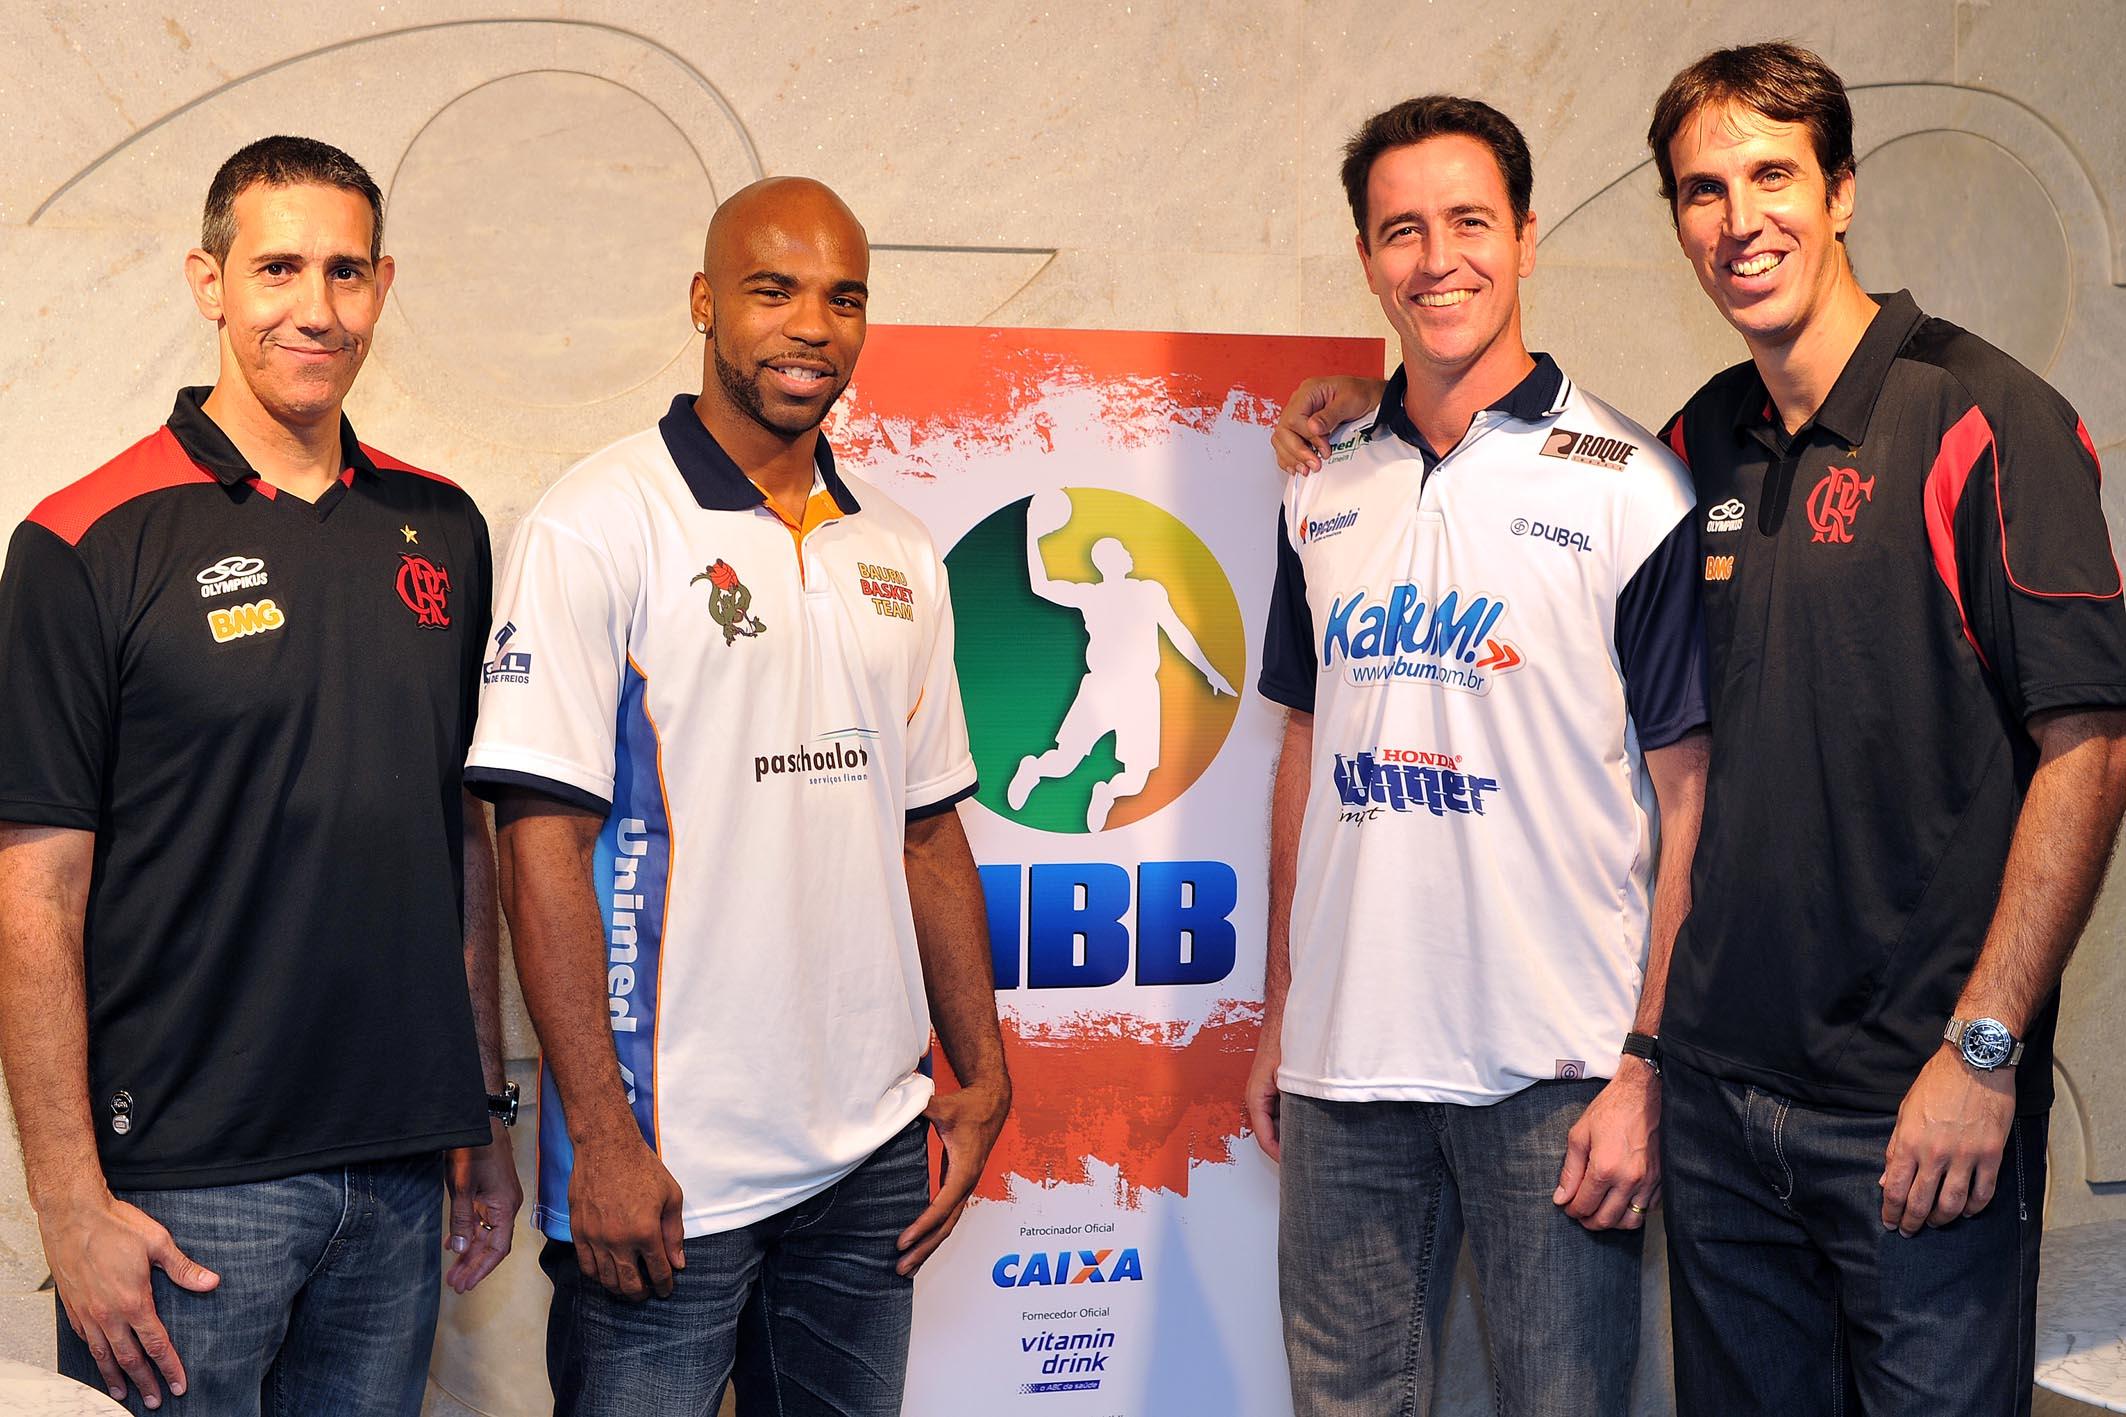 José Neto (Flamengo), Larry Taylor (Bauru), Demétrius Ferracciú (Limeira) e Marcelinho (Flamengo)